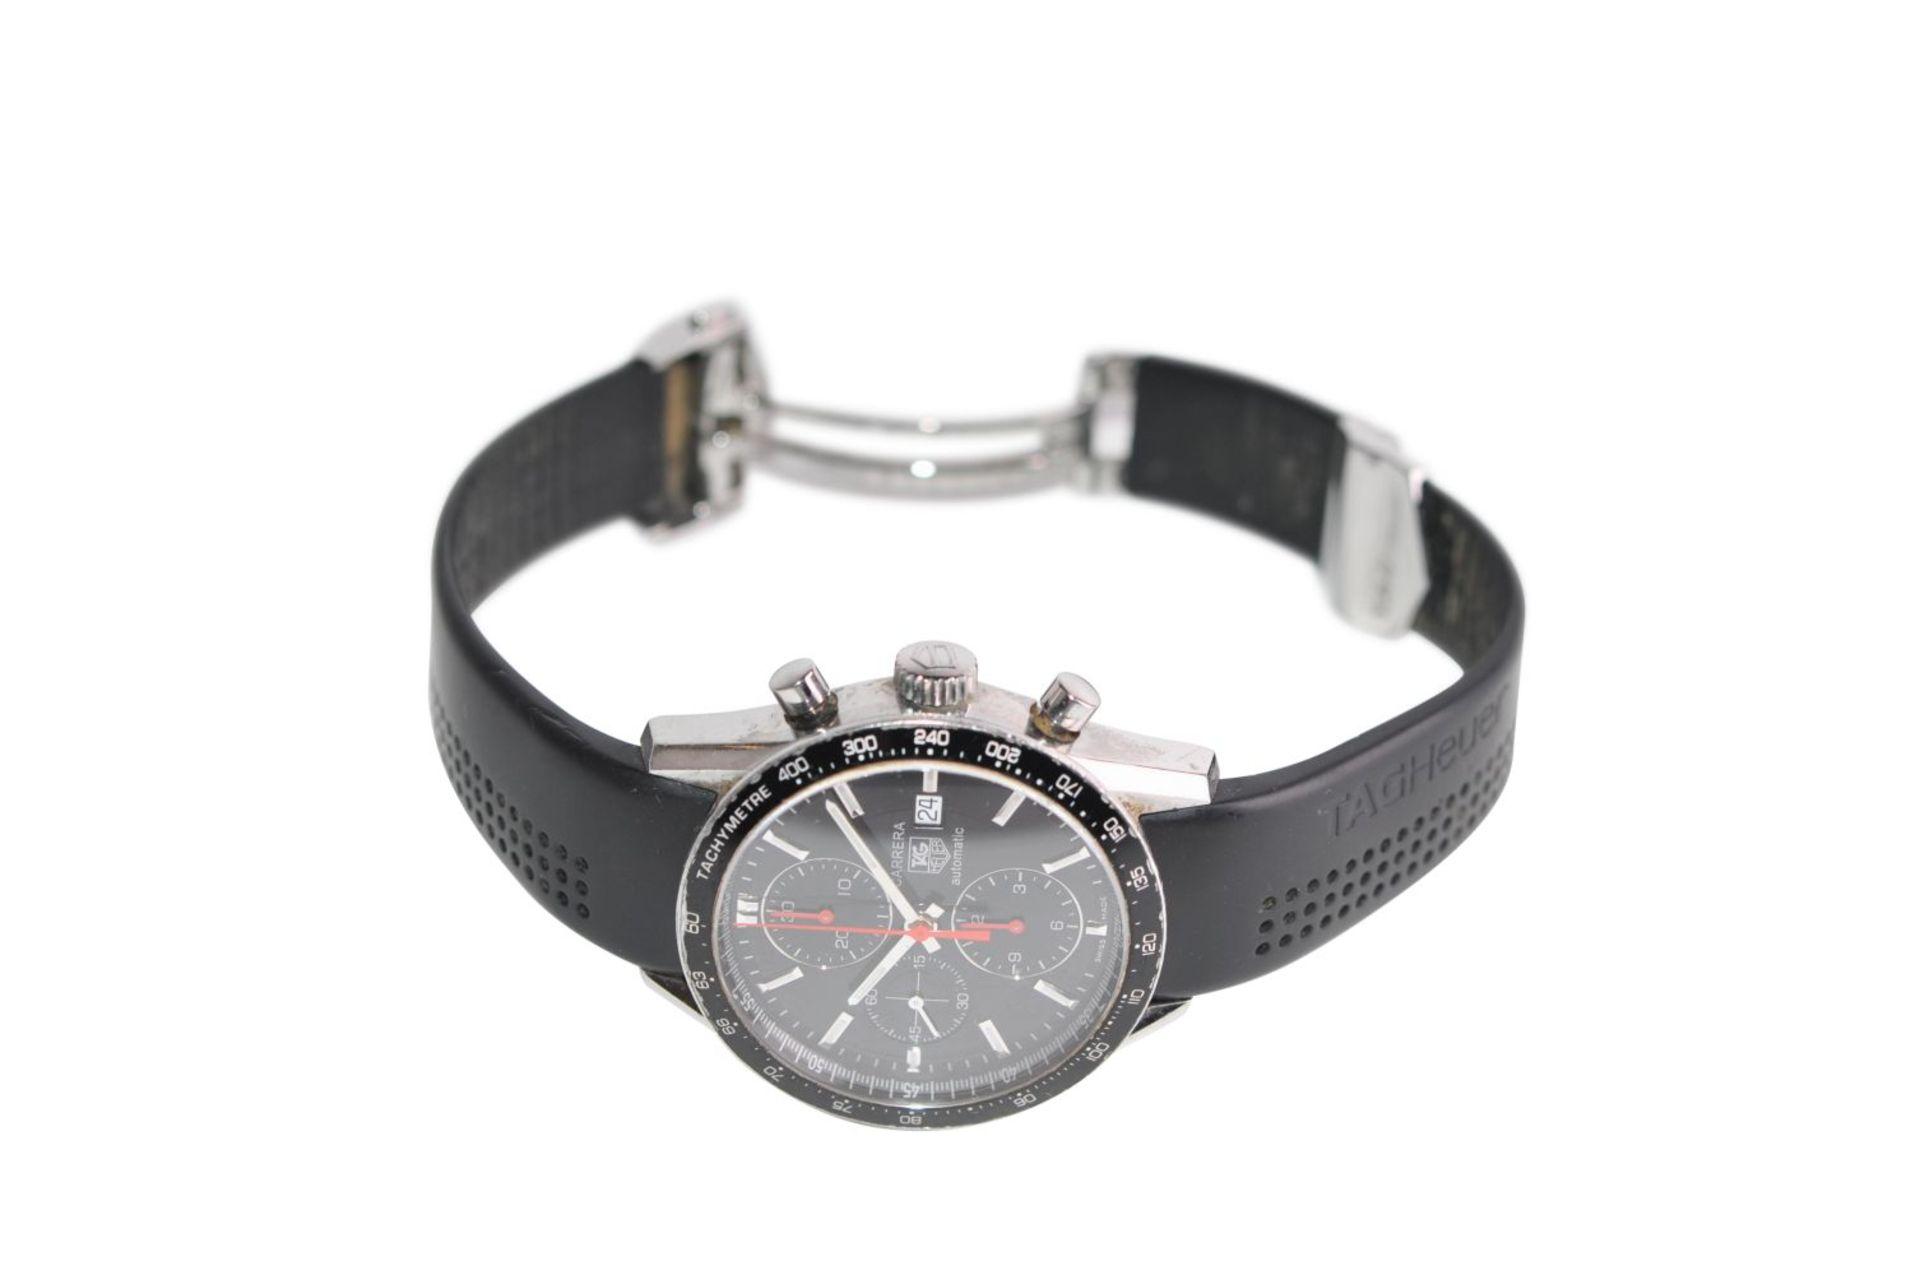 Los 44 - Tag Heuer Carrera41mm automatic TAG Heuer steel watchModel: Carrera Caliber 16 Chronograph